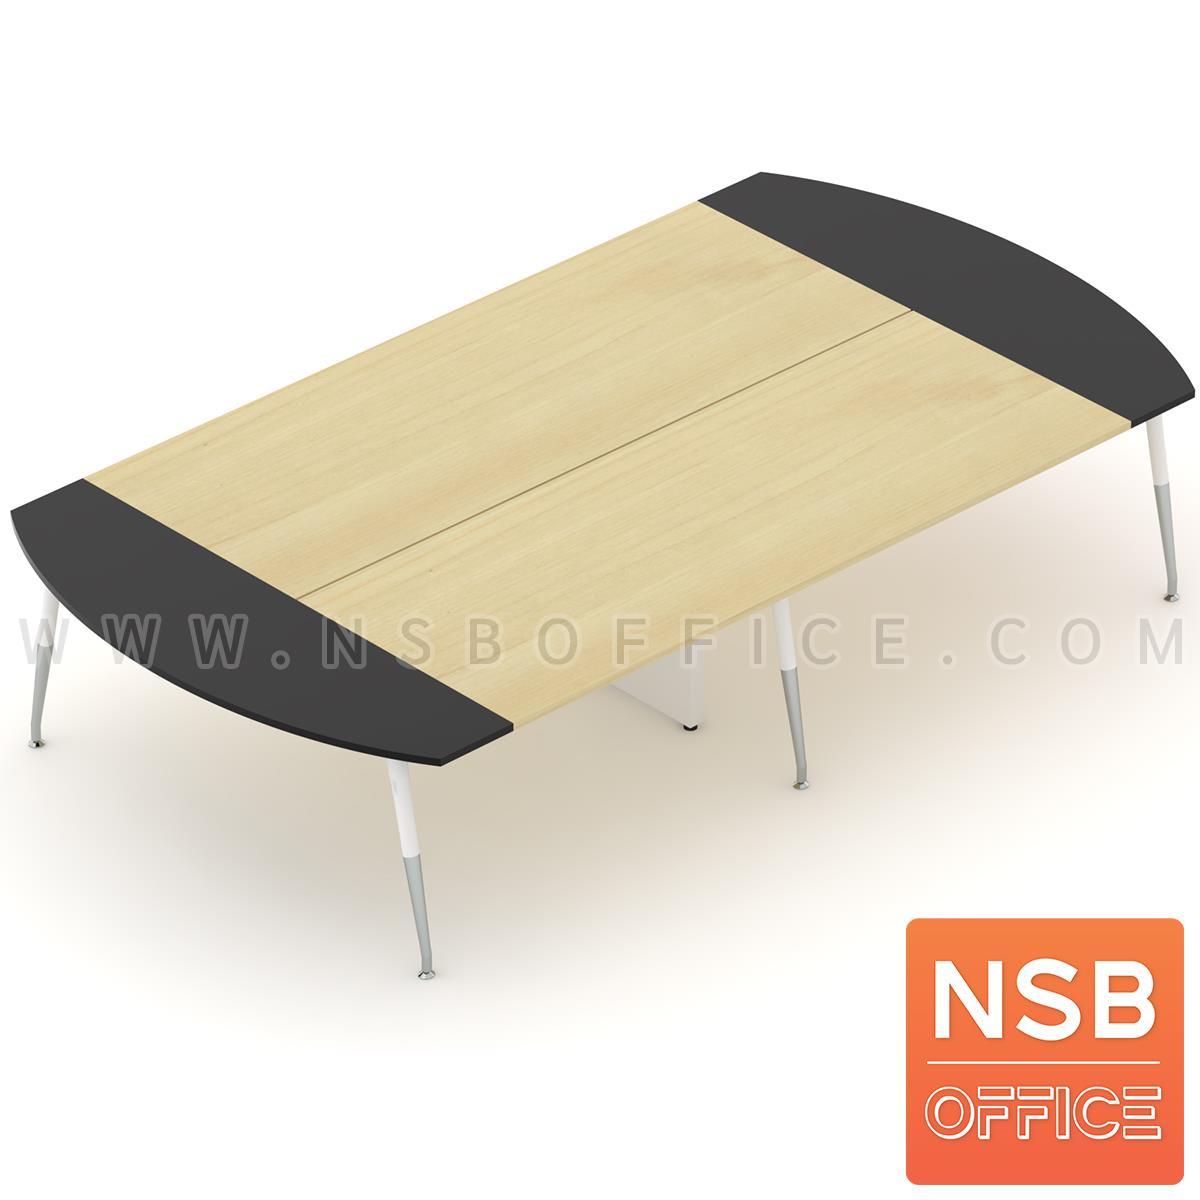 A05A169:โต๊ะประชุมหัวโค้ง ขาปลายเรียว ลึก 180 cm.  ขากลางมีกล่องนำสายไฟ